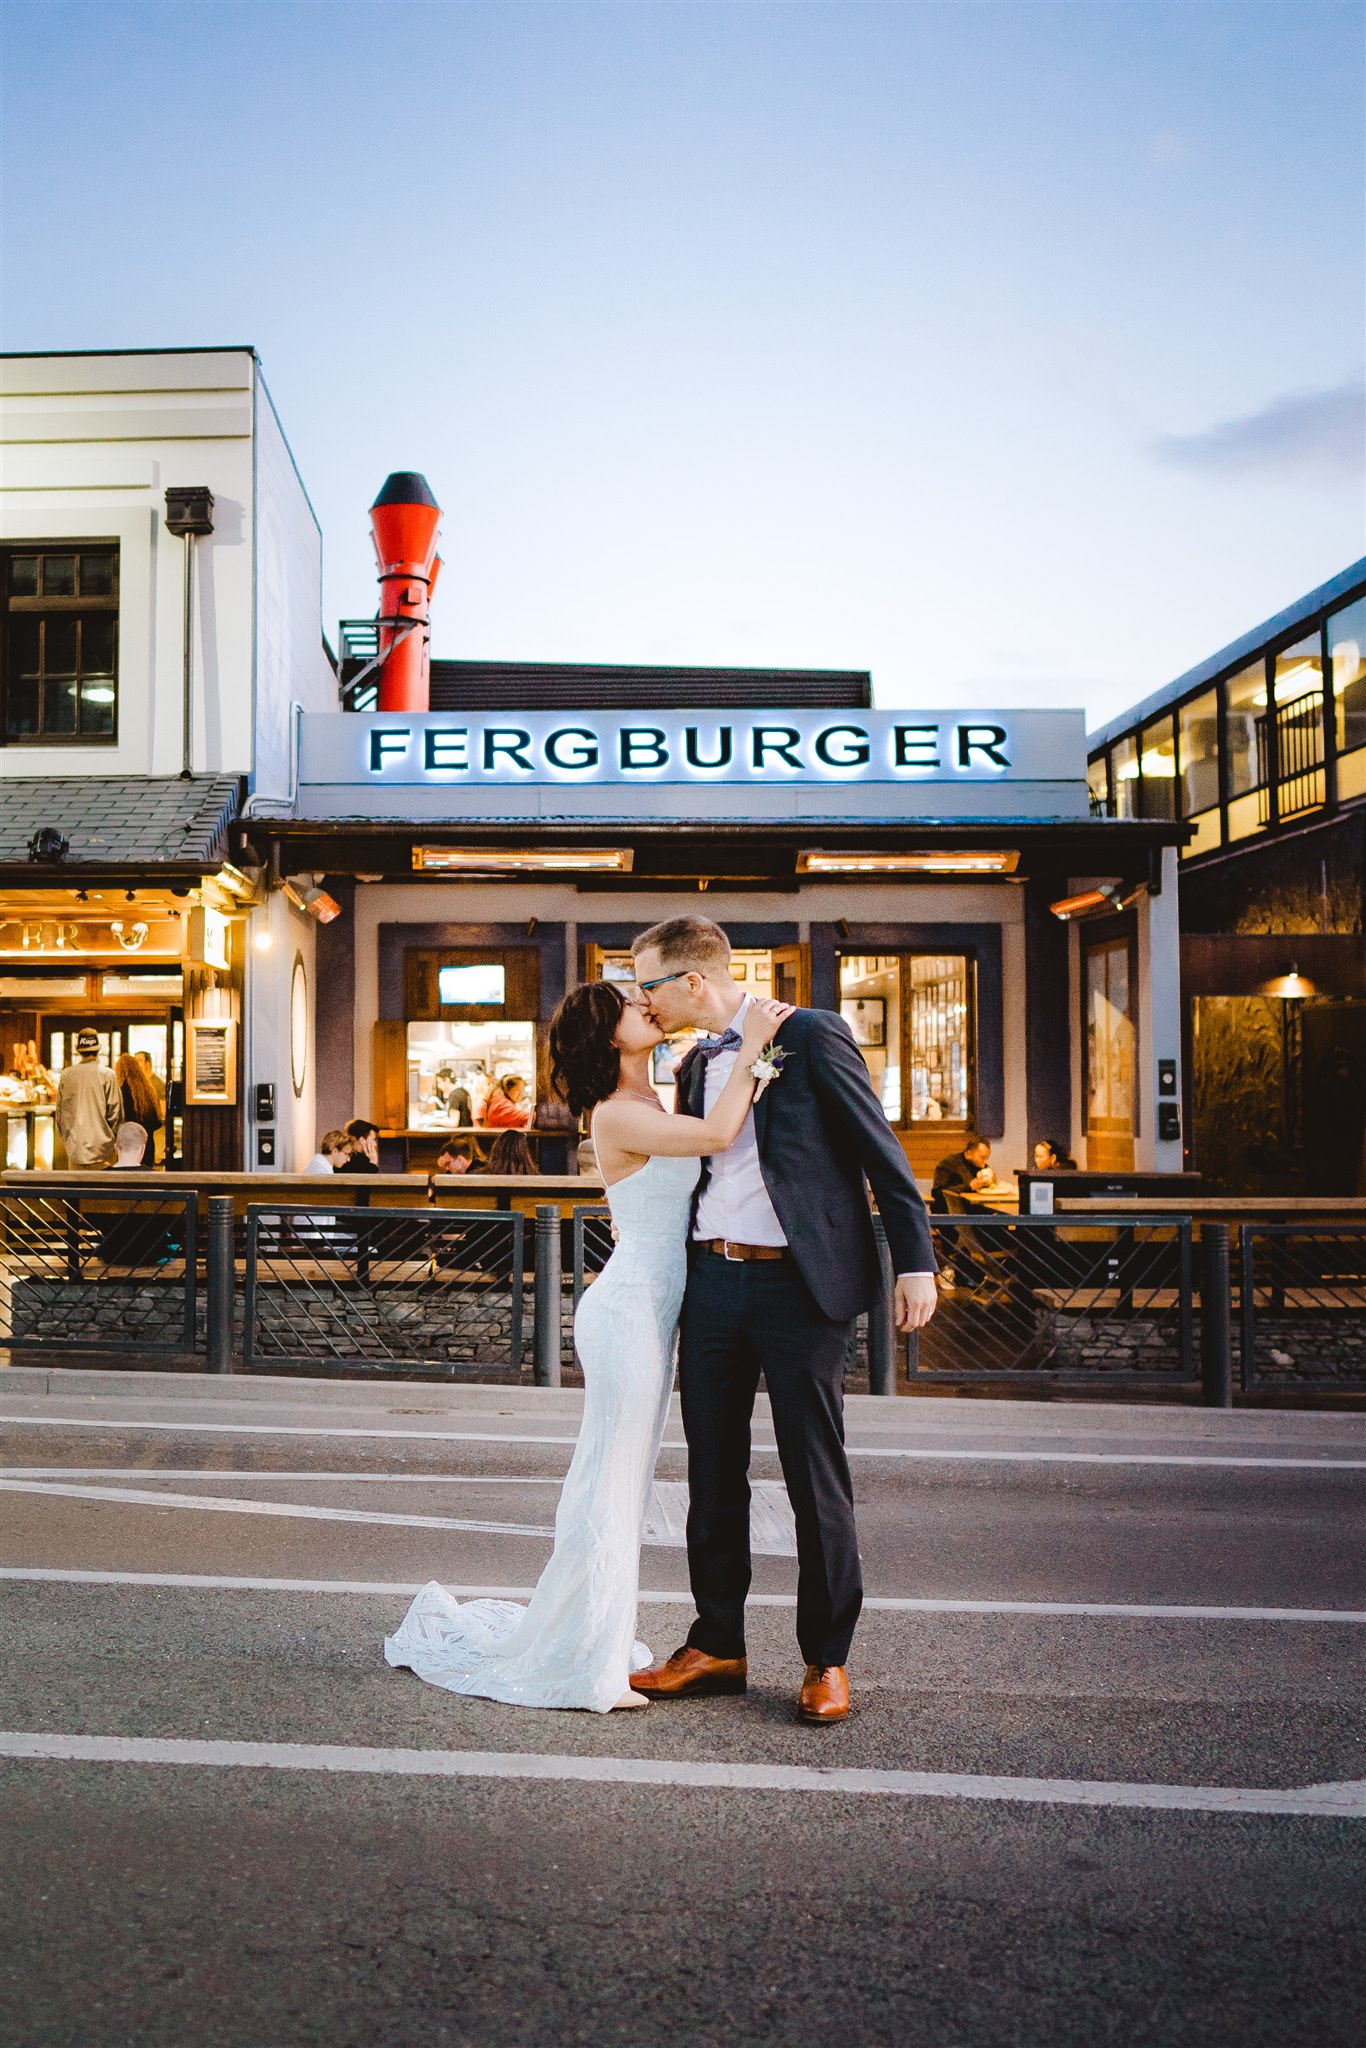 Queenstown wedding couple outside Fergburger Queenstown in wedding dress and wedding suit kissing